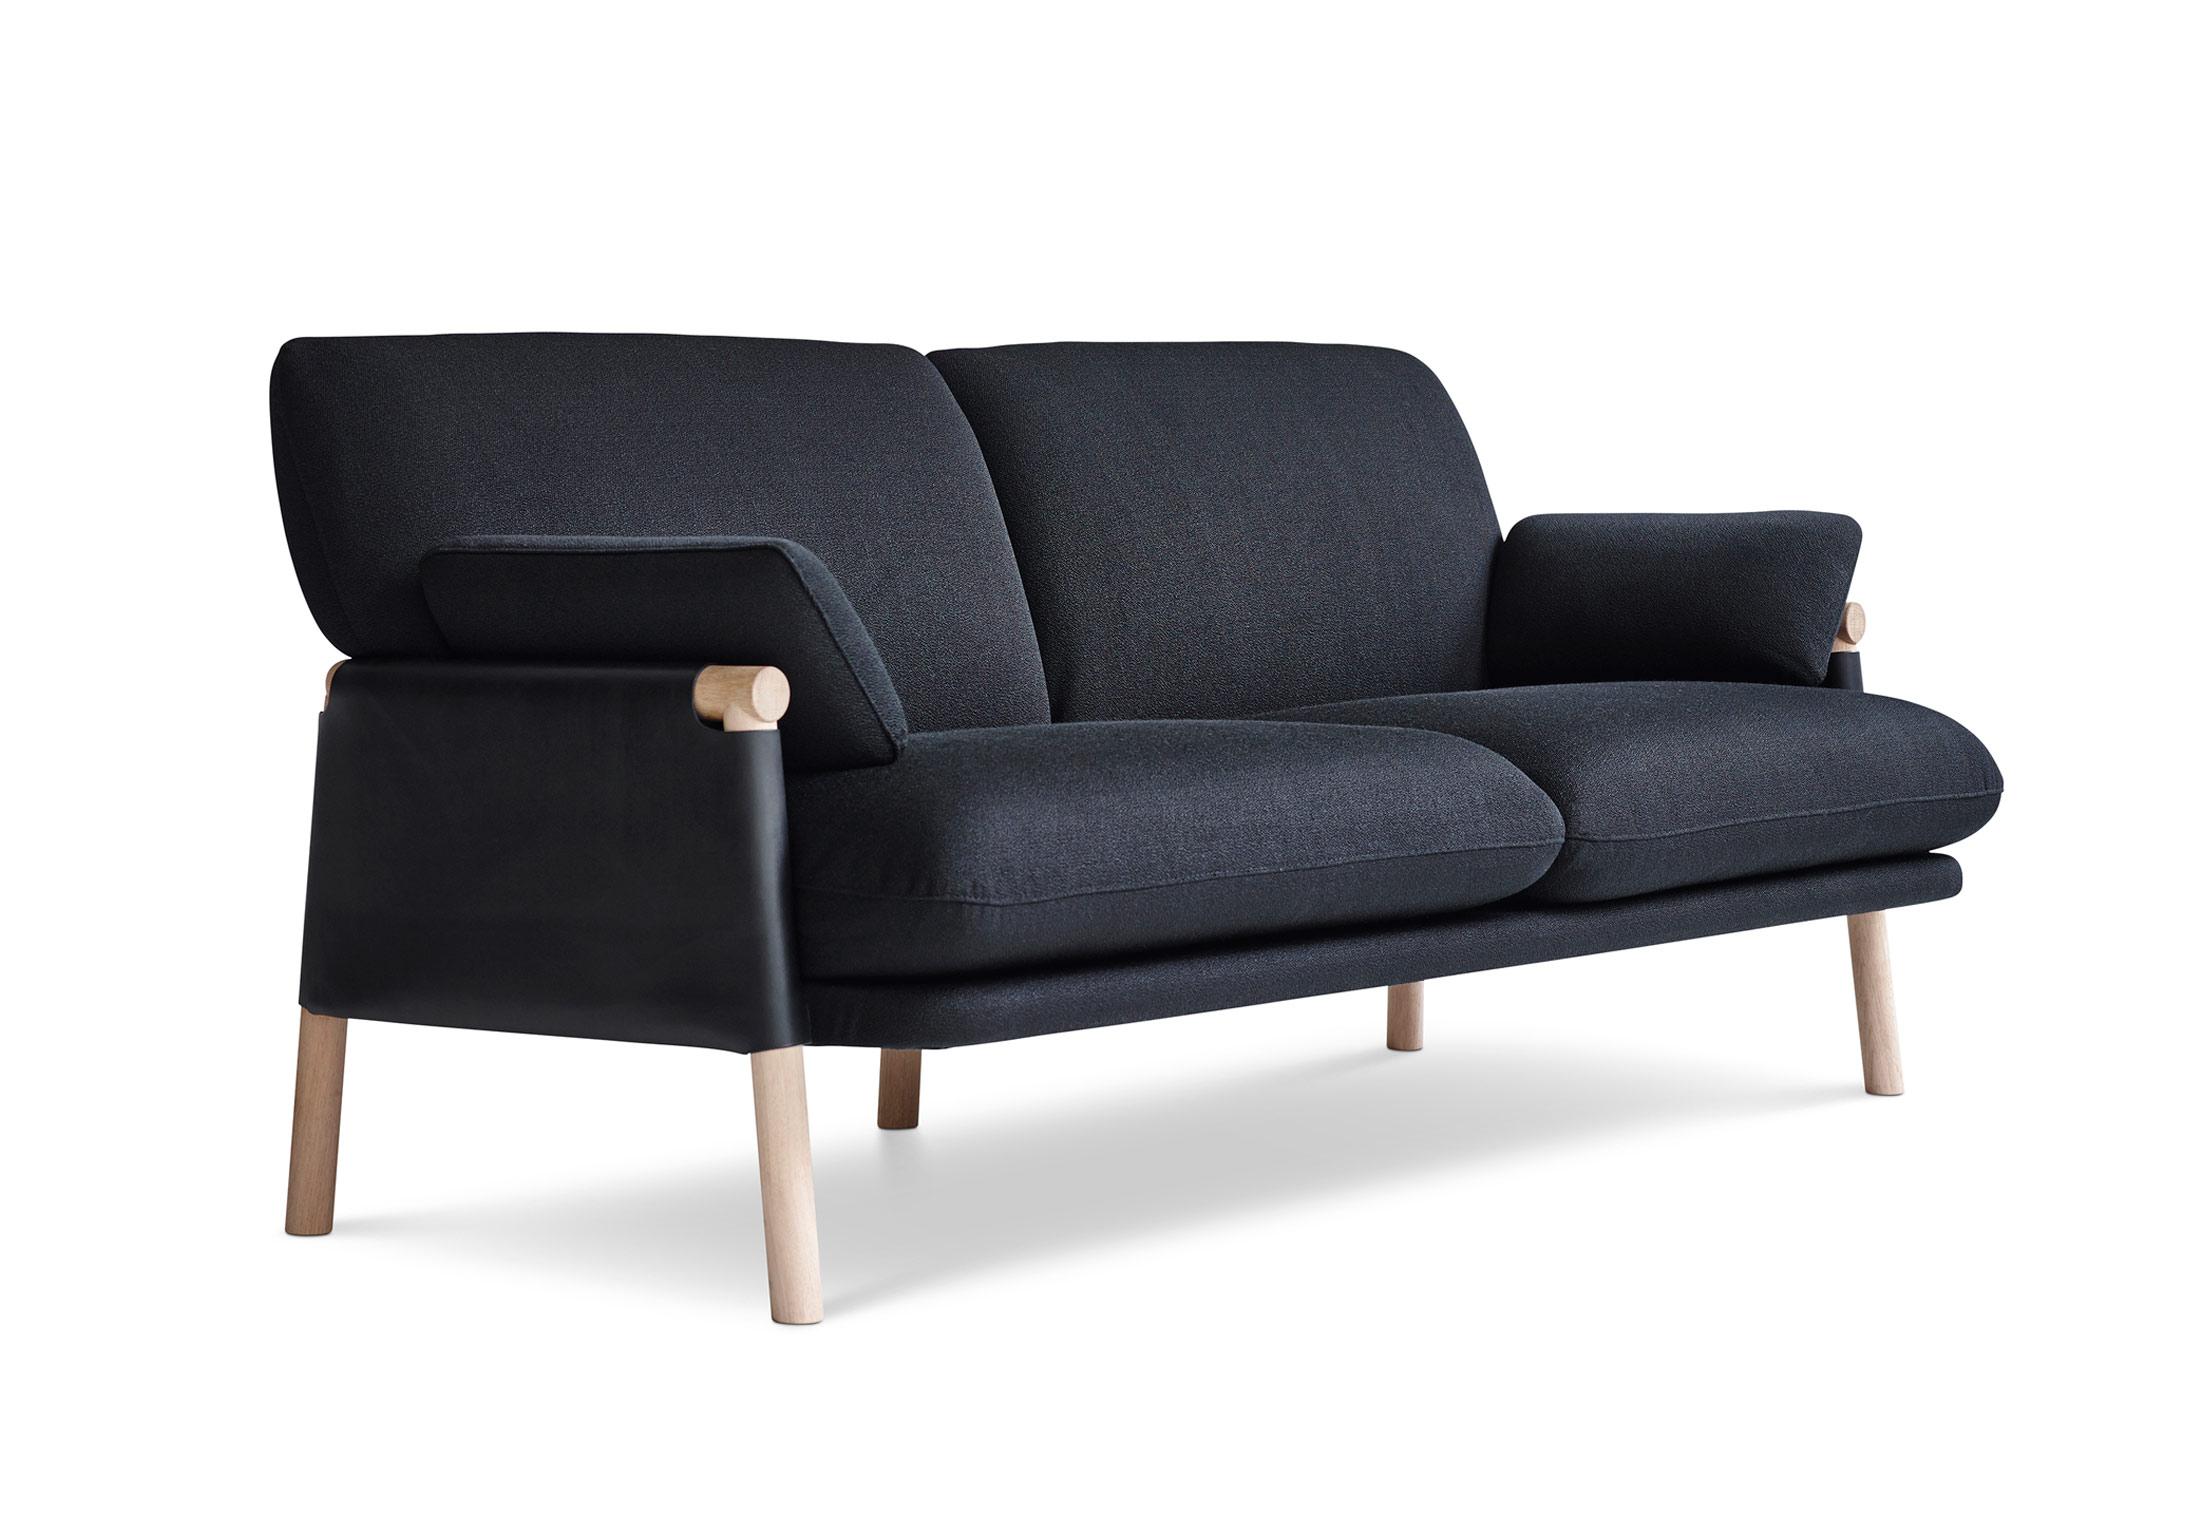 Bernhardt savannah chenille sofa refil sofa - Litera sofa carrefour ...